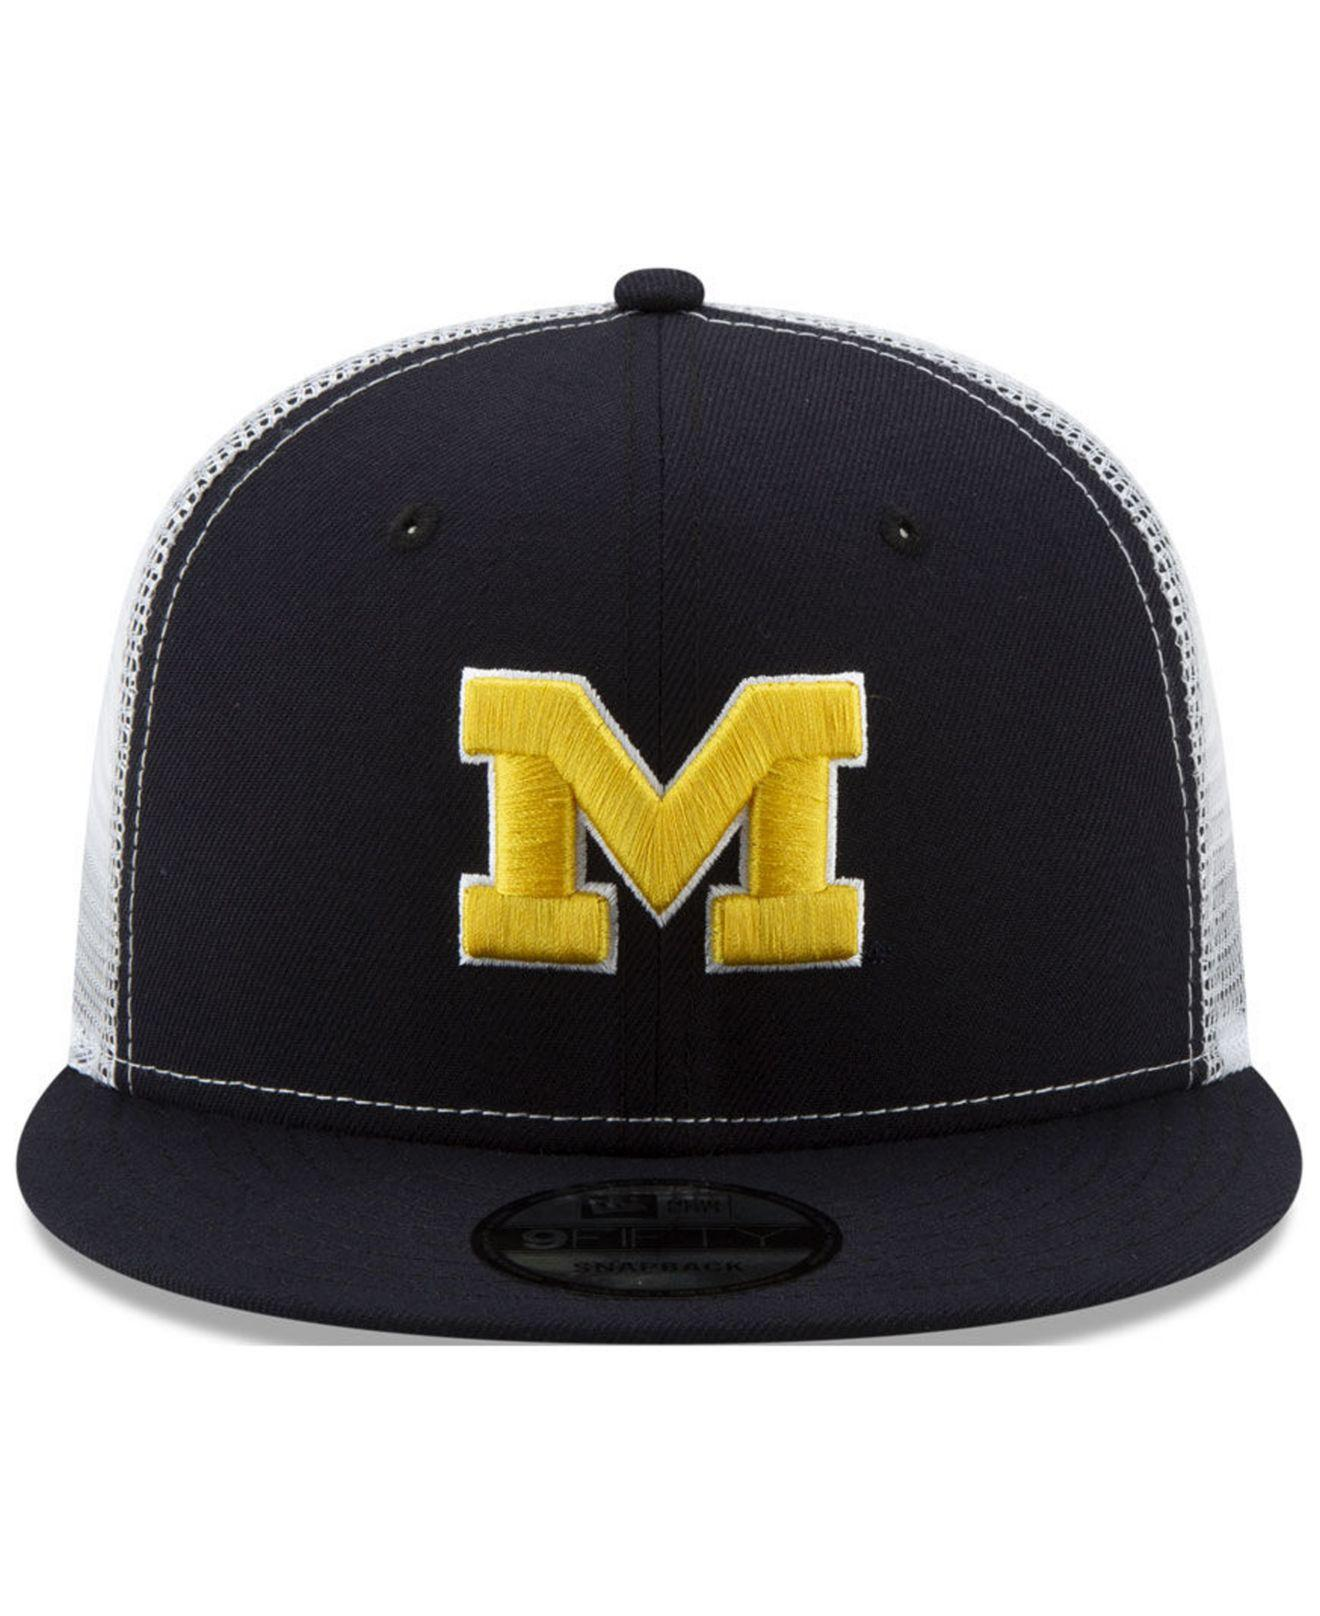 designer fashion e3098 f9e8f Lyst - KTZ Michigan Wolverines Tc Meshback Snapback Cap in Blue for Men